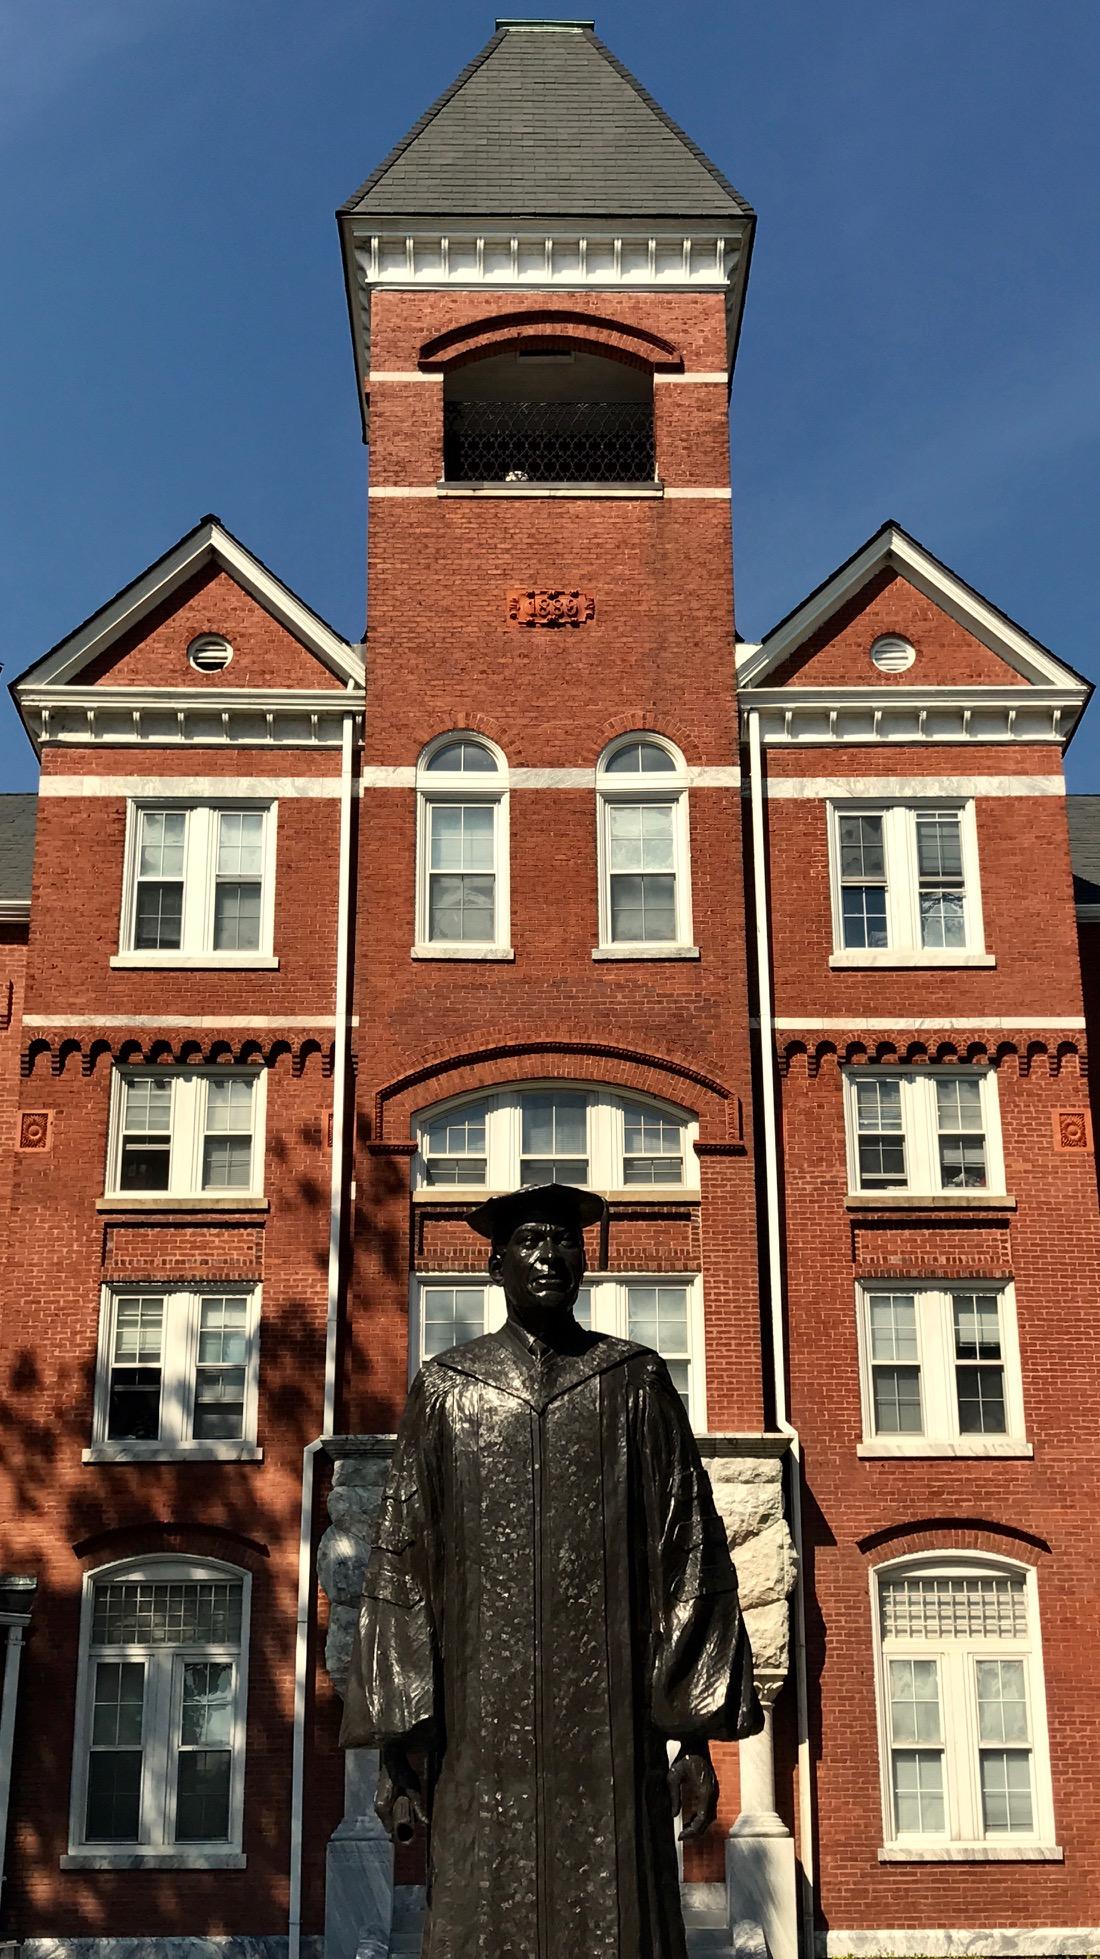 Benjamin E. Mays at Morehouse College by Kelly Jordan